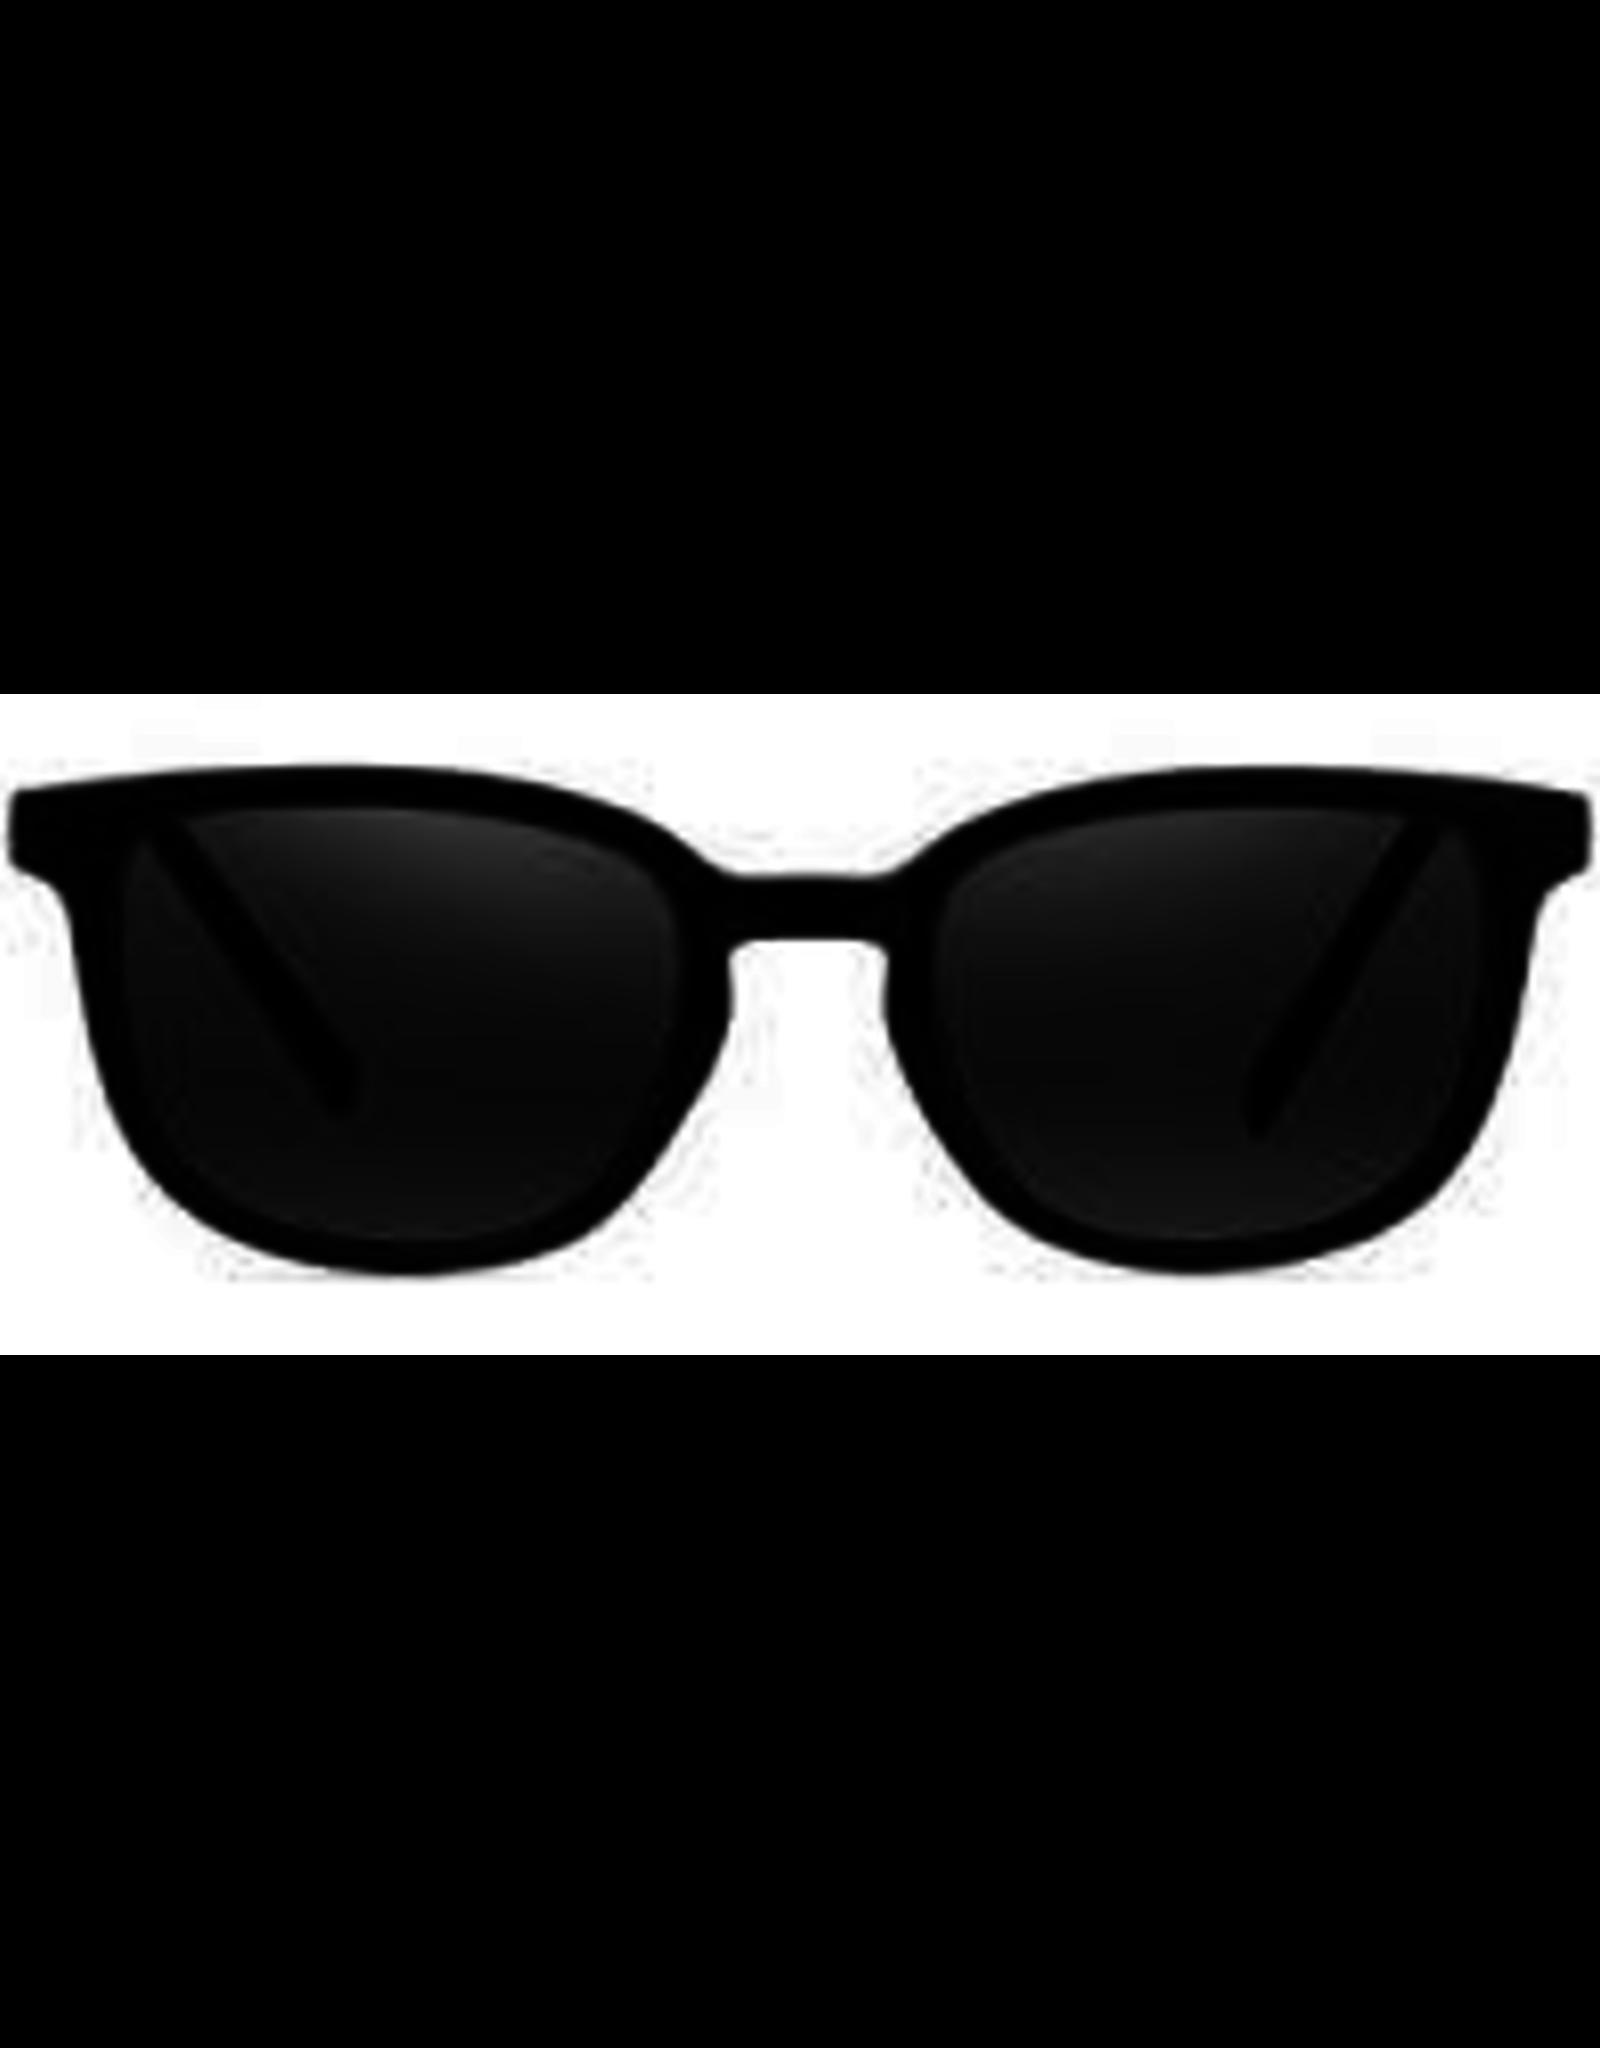 NECTAR NECTAR SUNGLASSES LOWCOUNTRY GLOSSY BLACK FRAME- SMOKE LENS